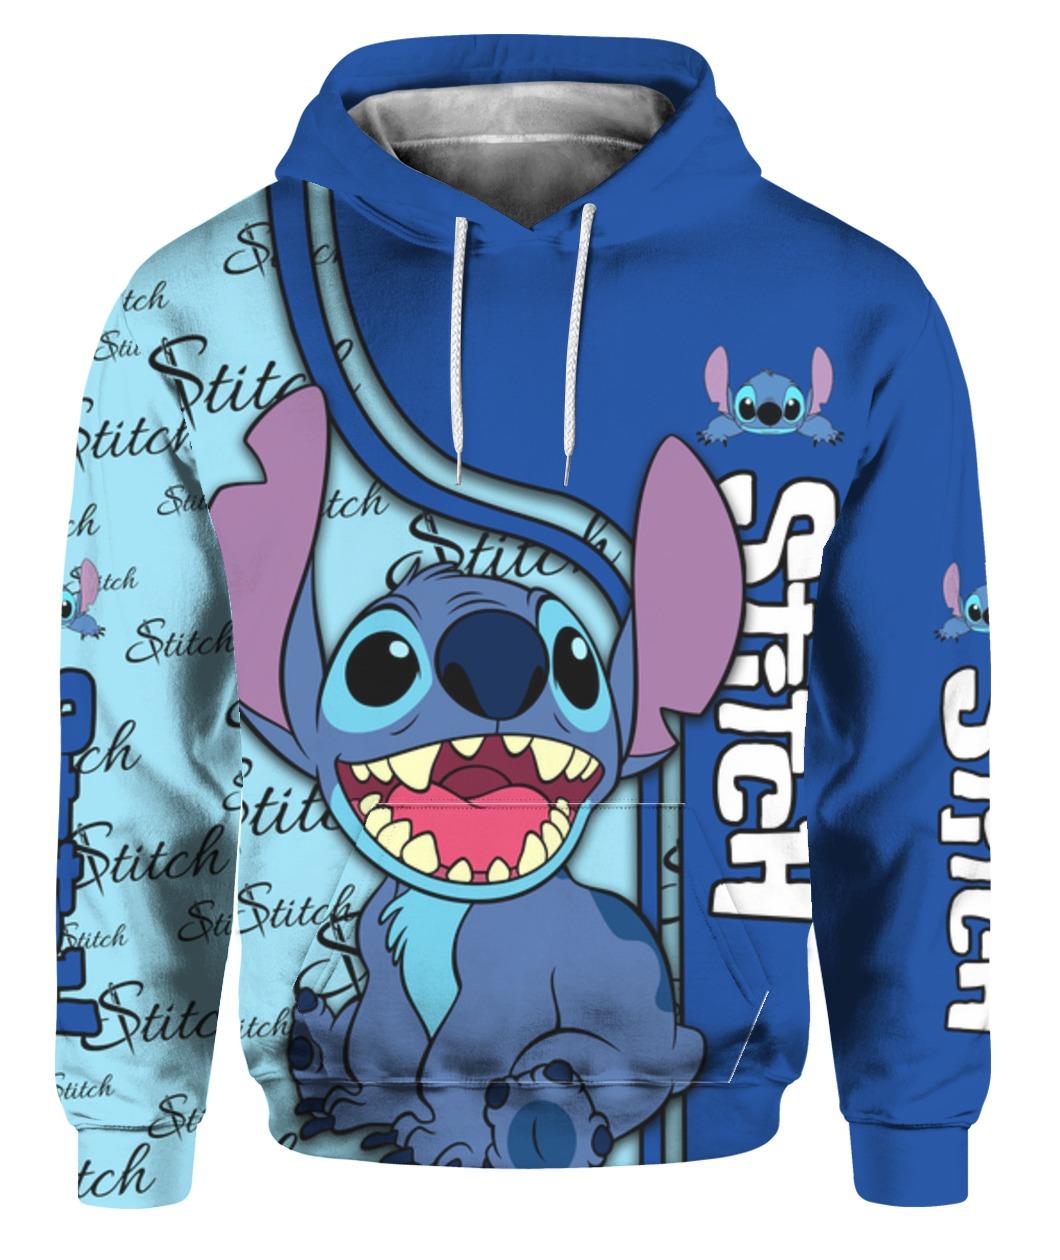 Stitch full printing hoodie 1